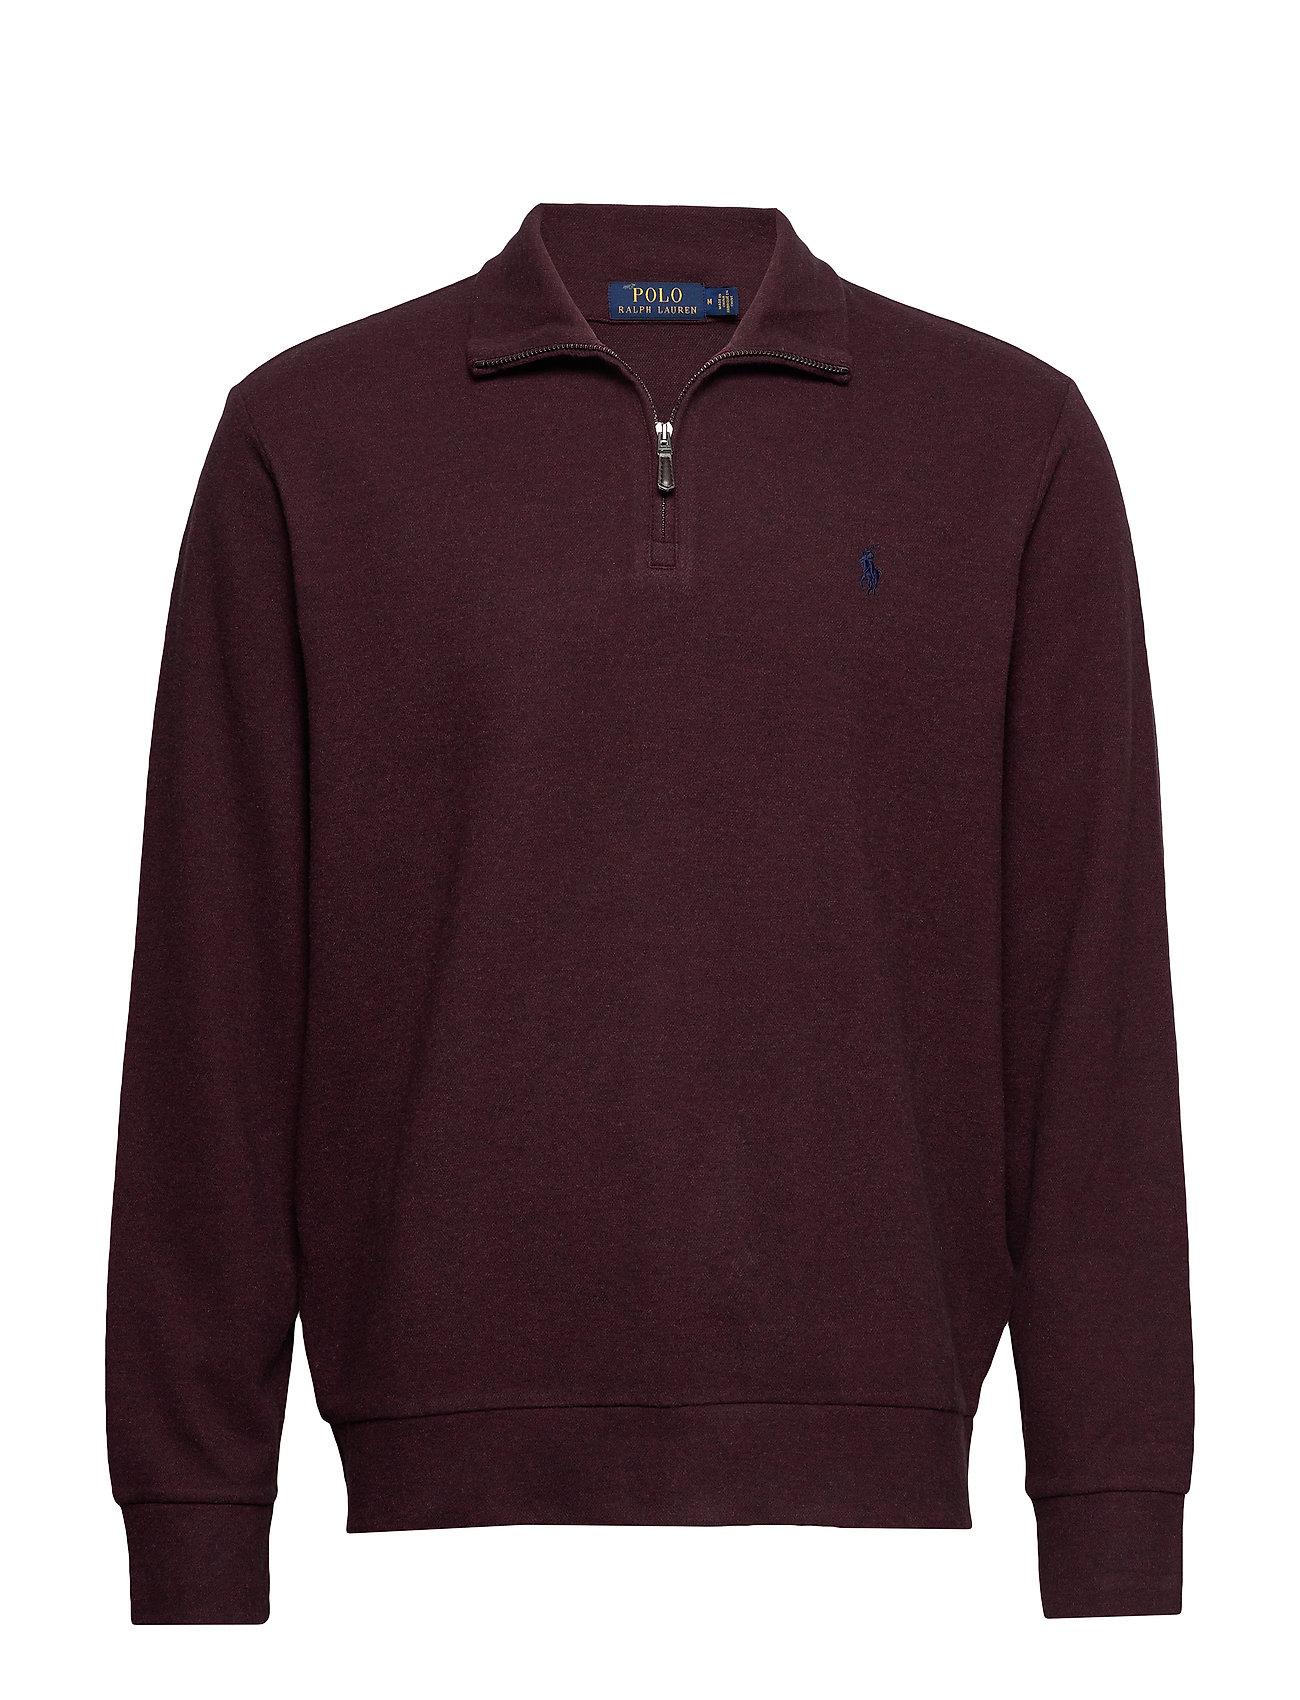 Polo Ralph Lauren Double-Knit Half-Zip Pullover - AGED WINE HEATHER